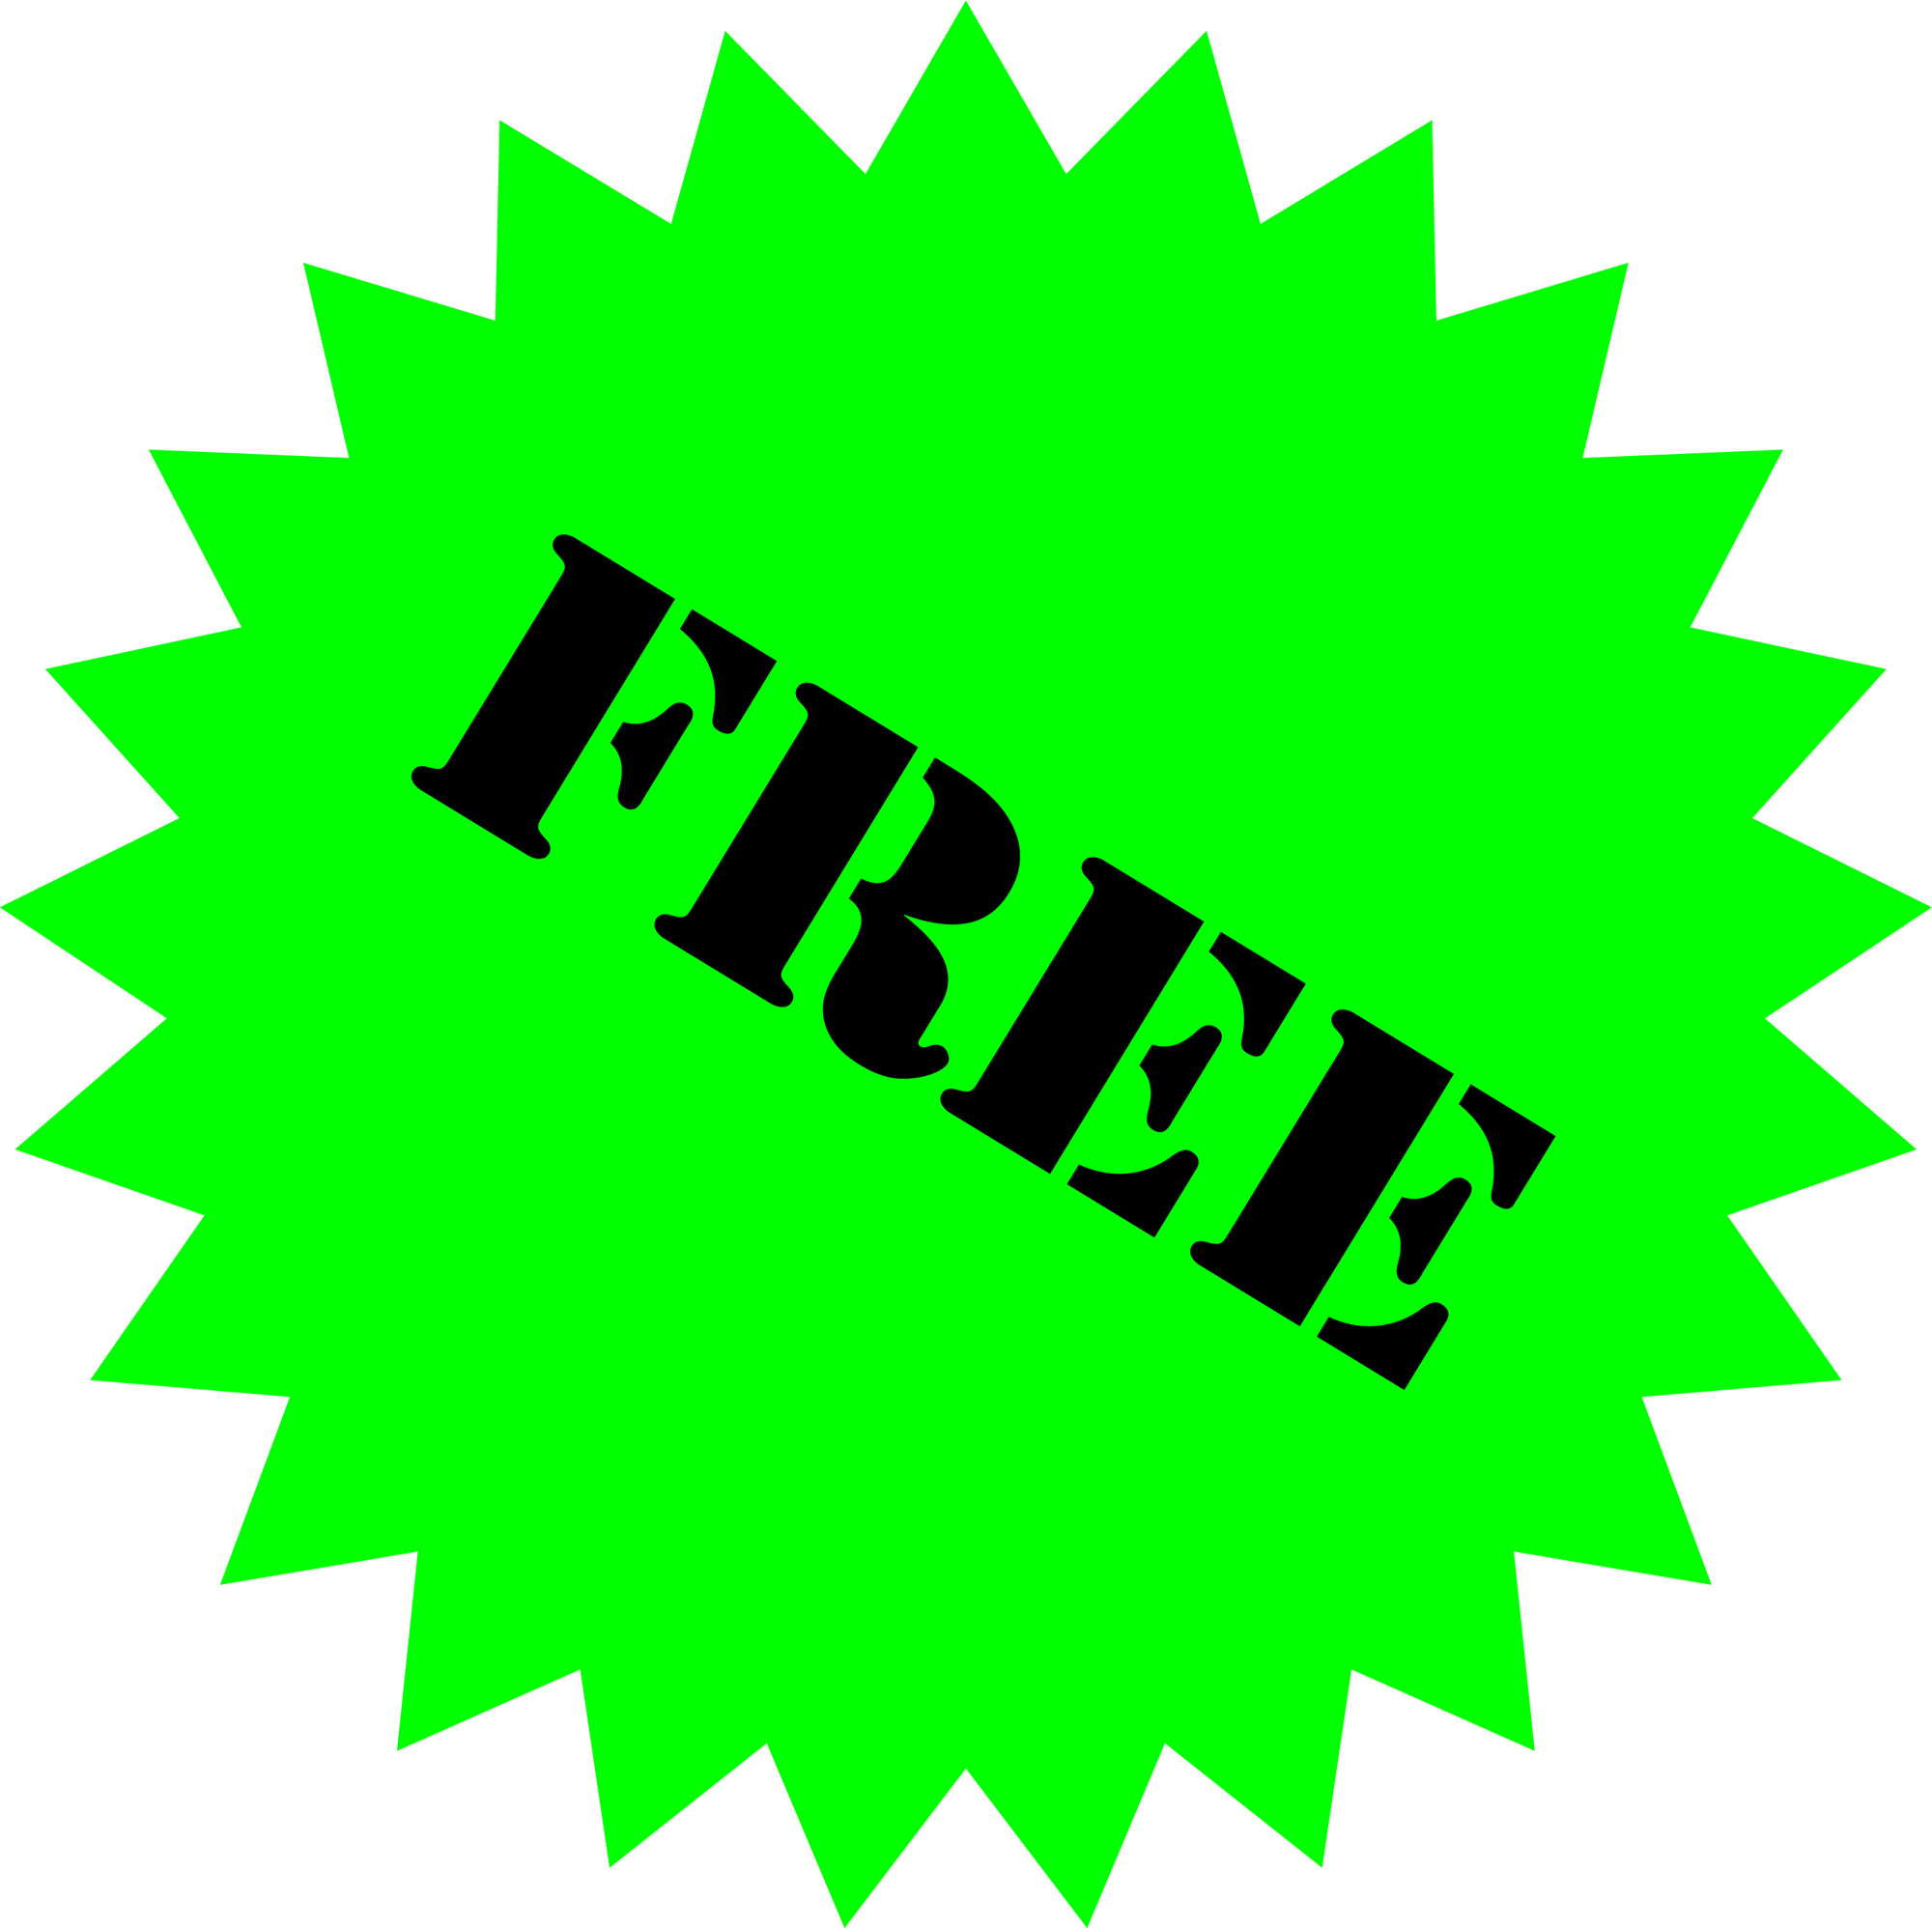 Free Stock Photo 483greensalestarjpg  Freeimageslive